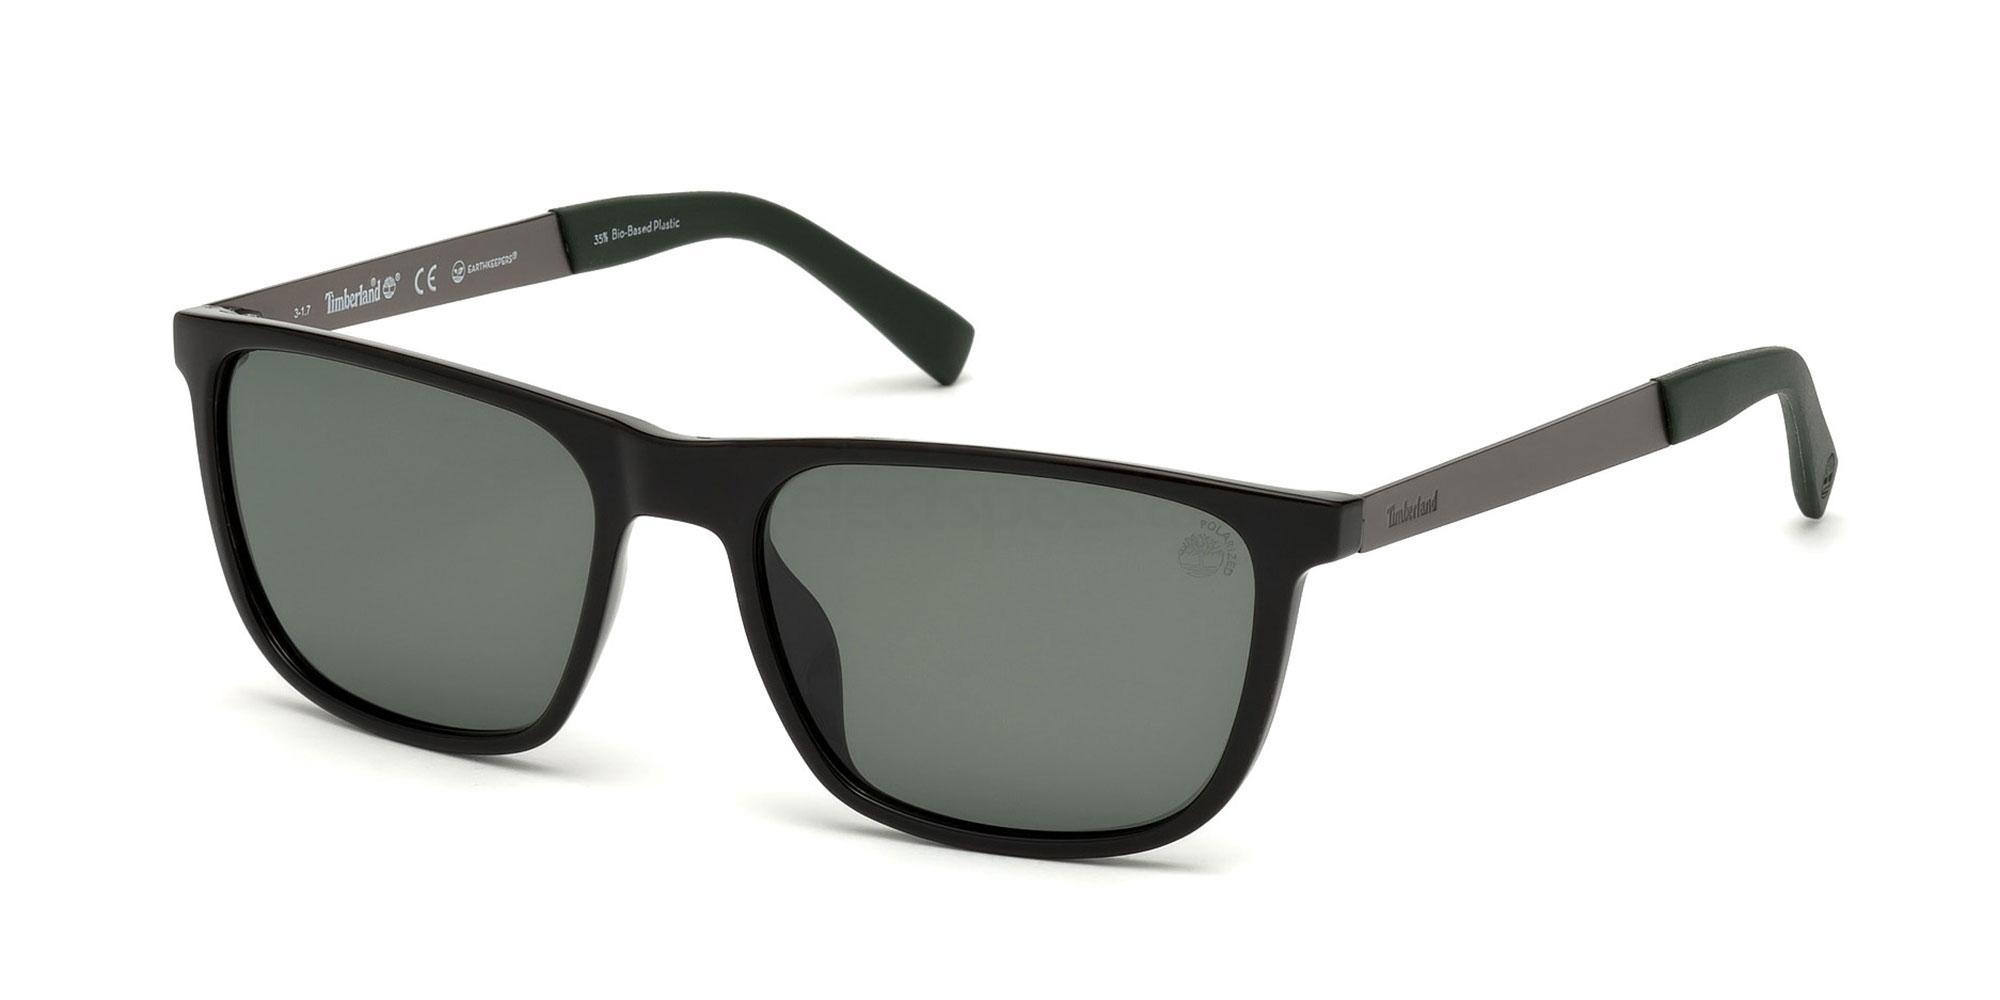 01R TB9131 Sunglasses, Timberland